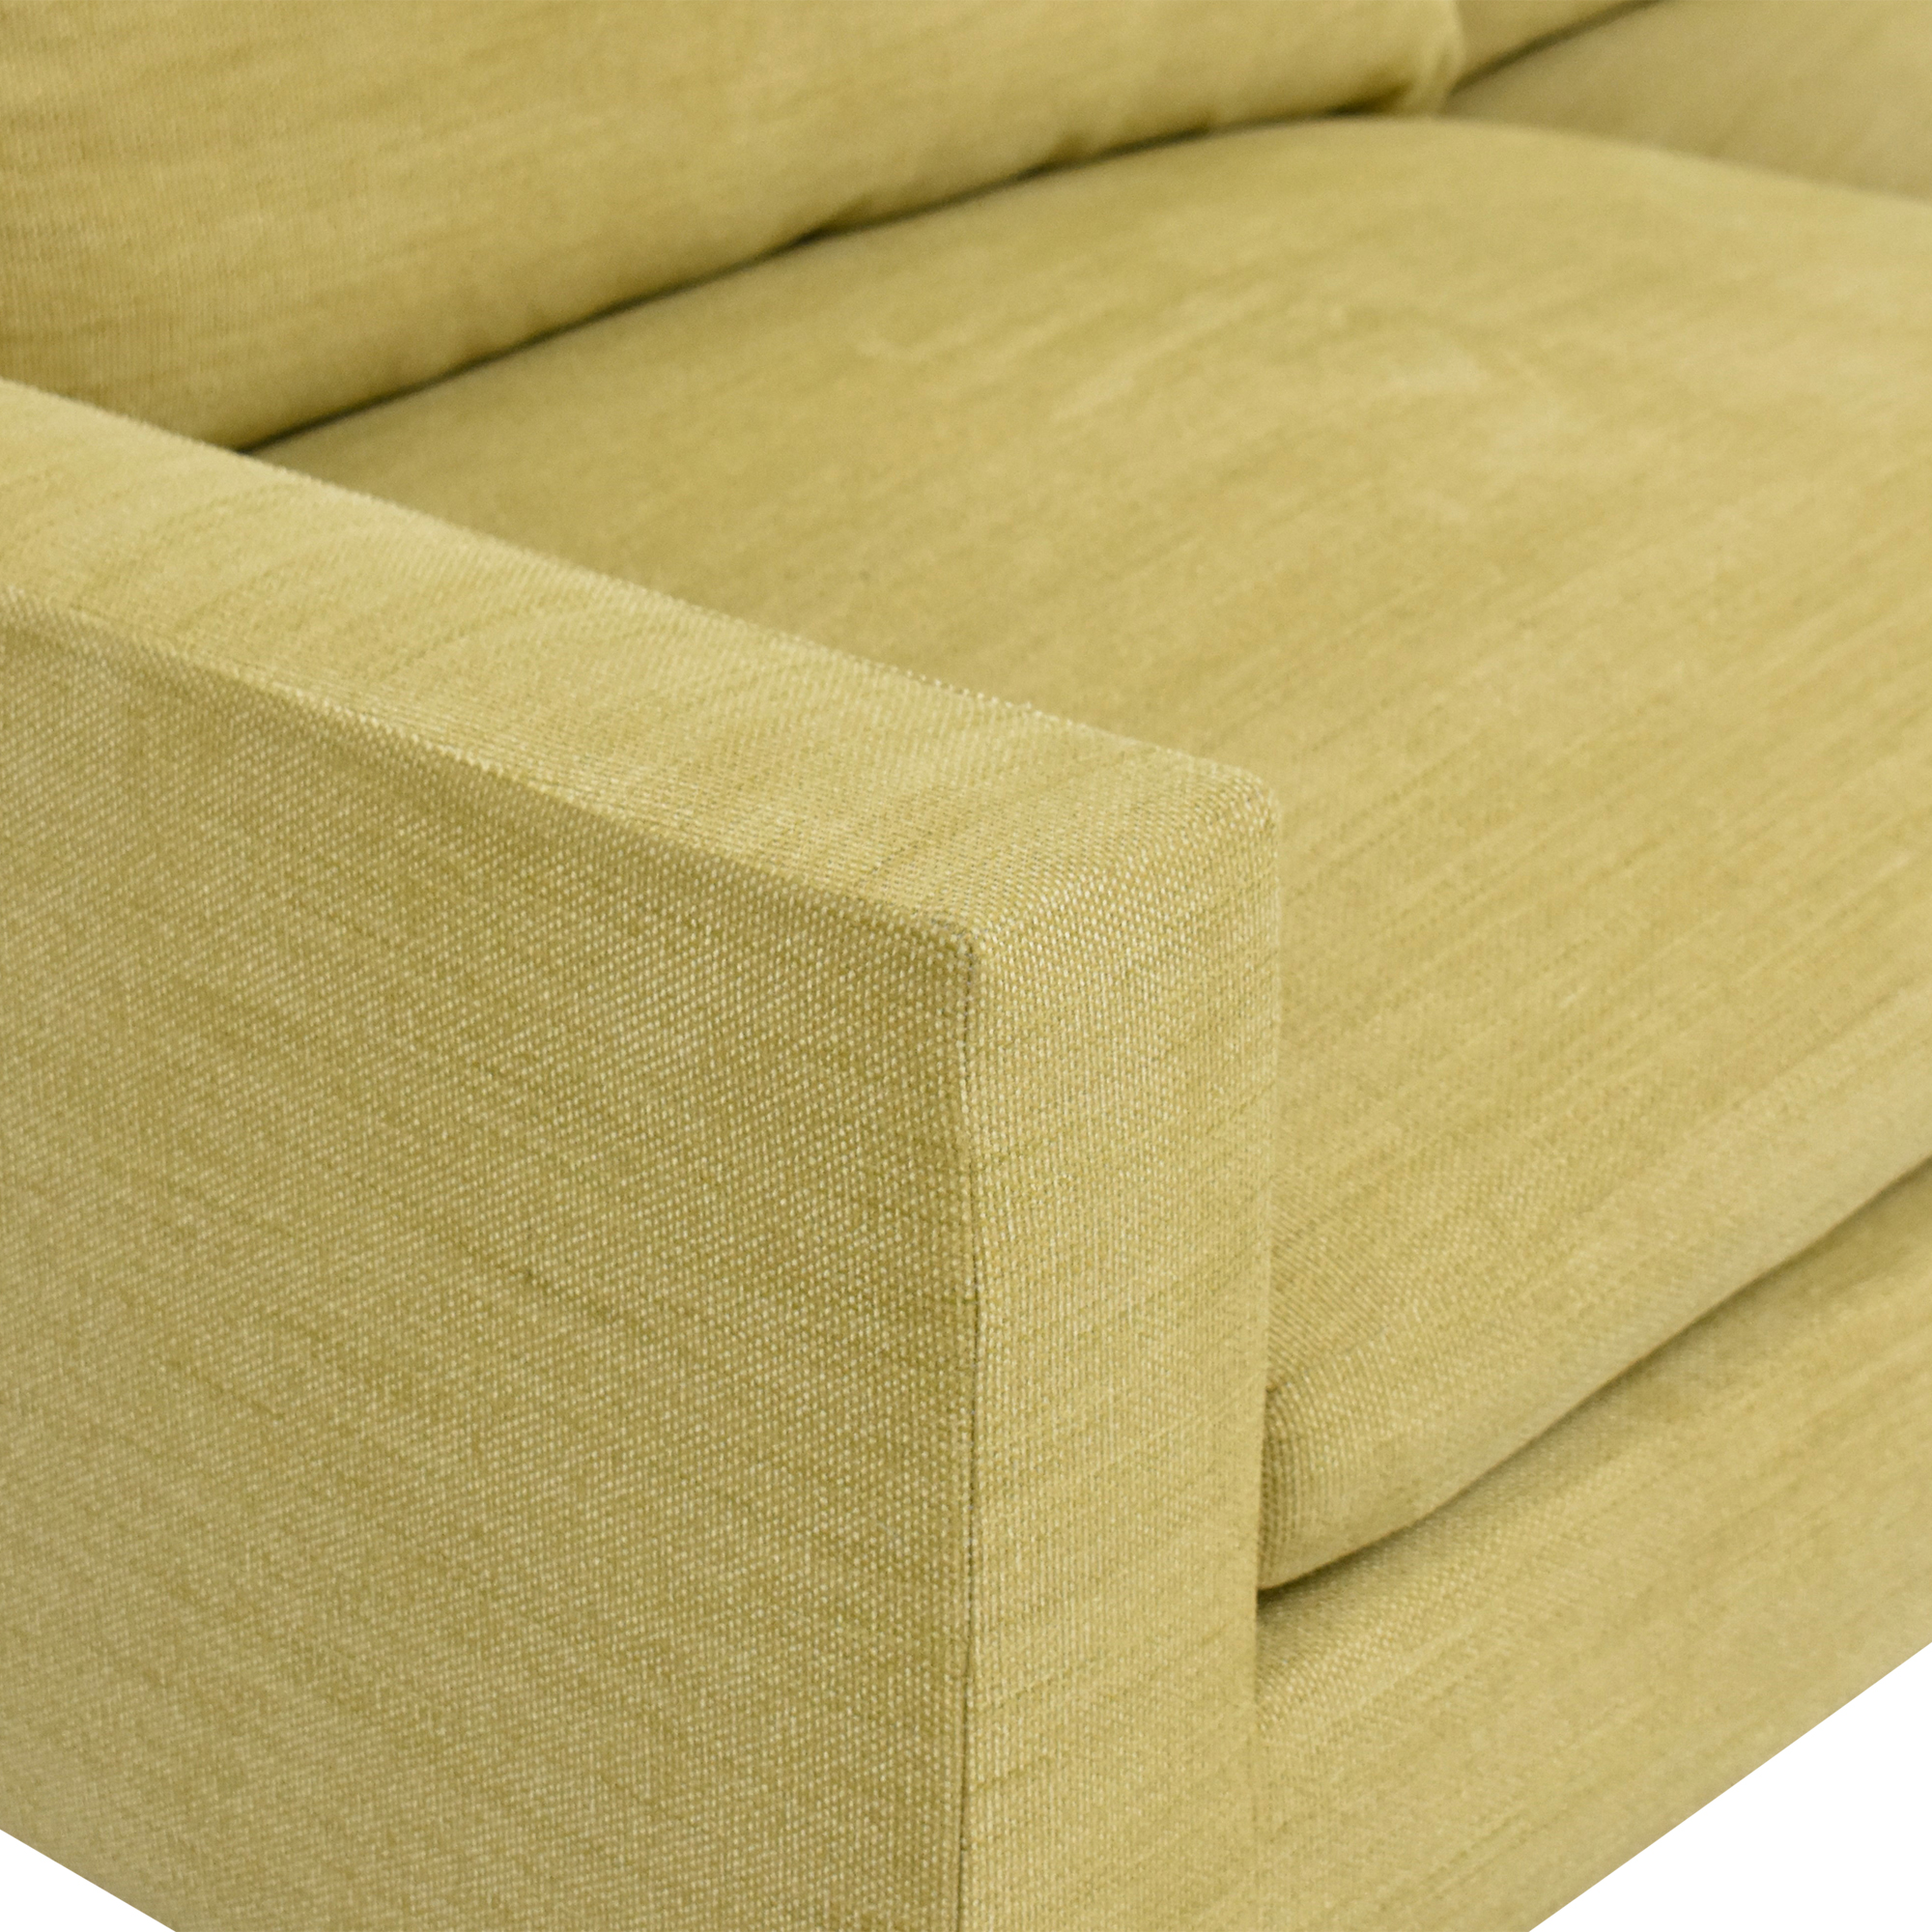 West Elm West Elm Harmony Two Cushion Sofa price